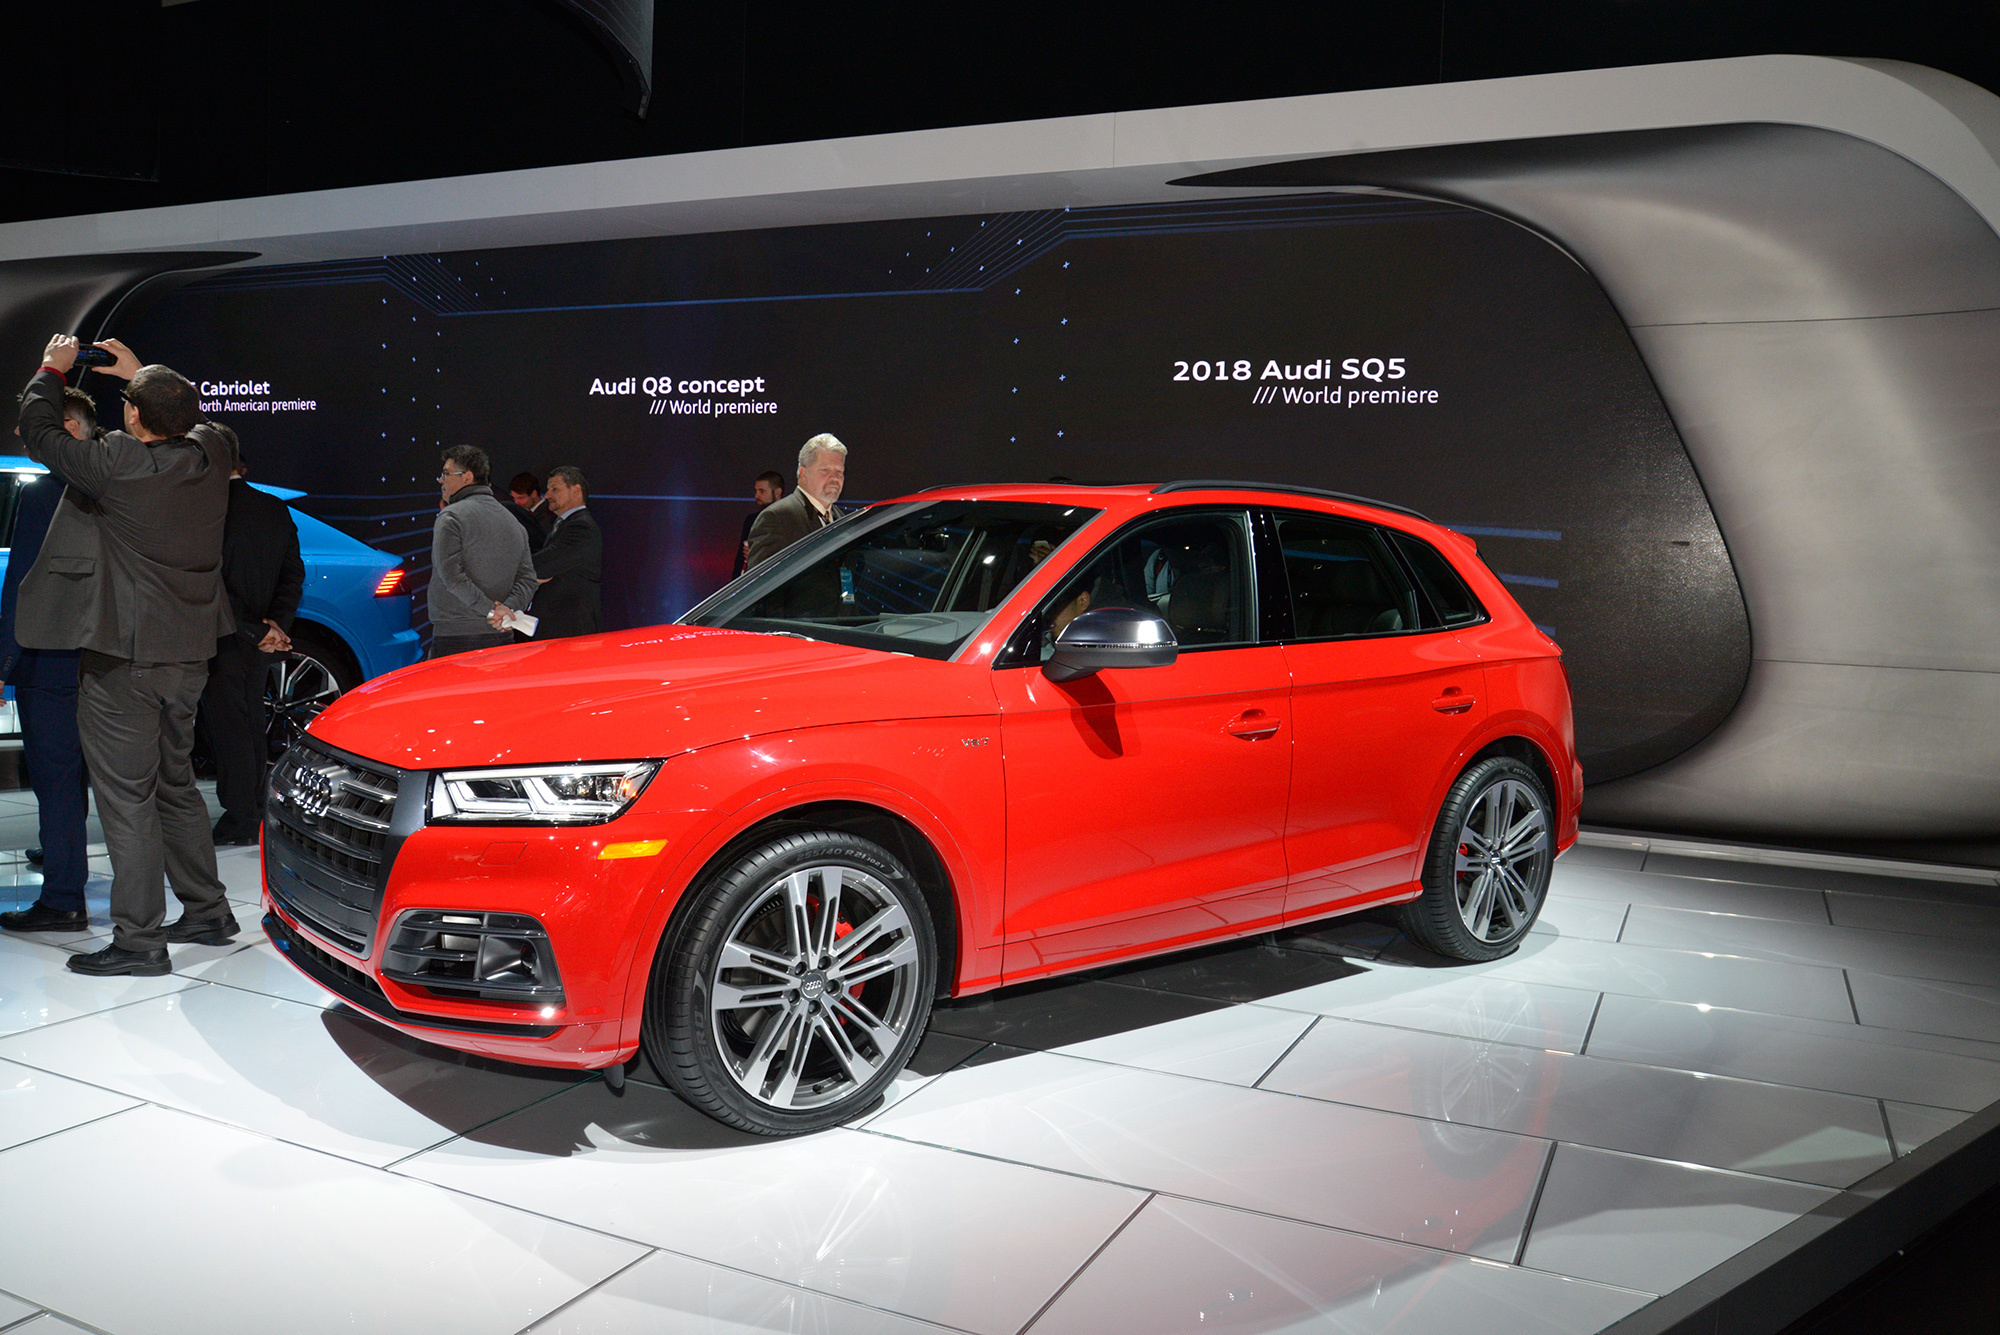 Audi Sq5 Wallpapers Hd